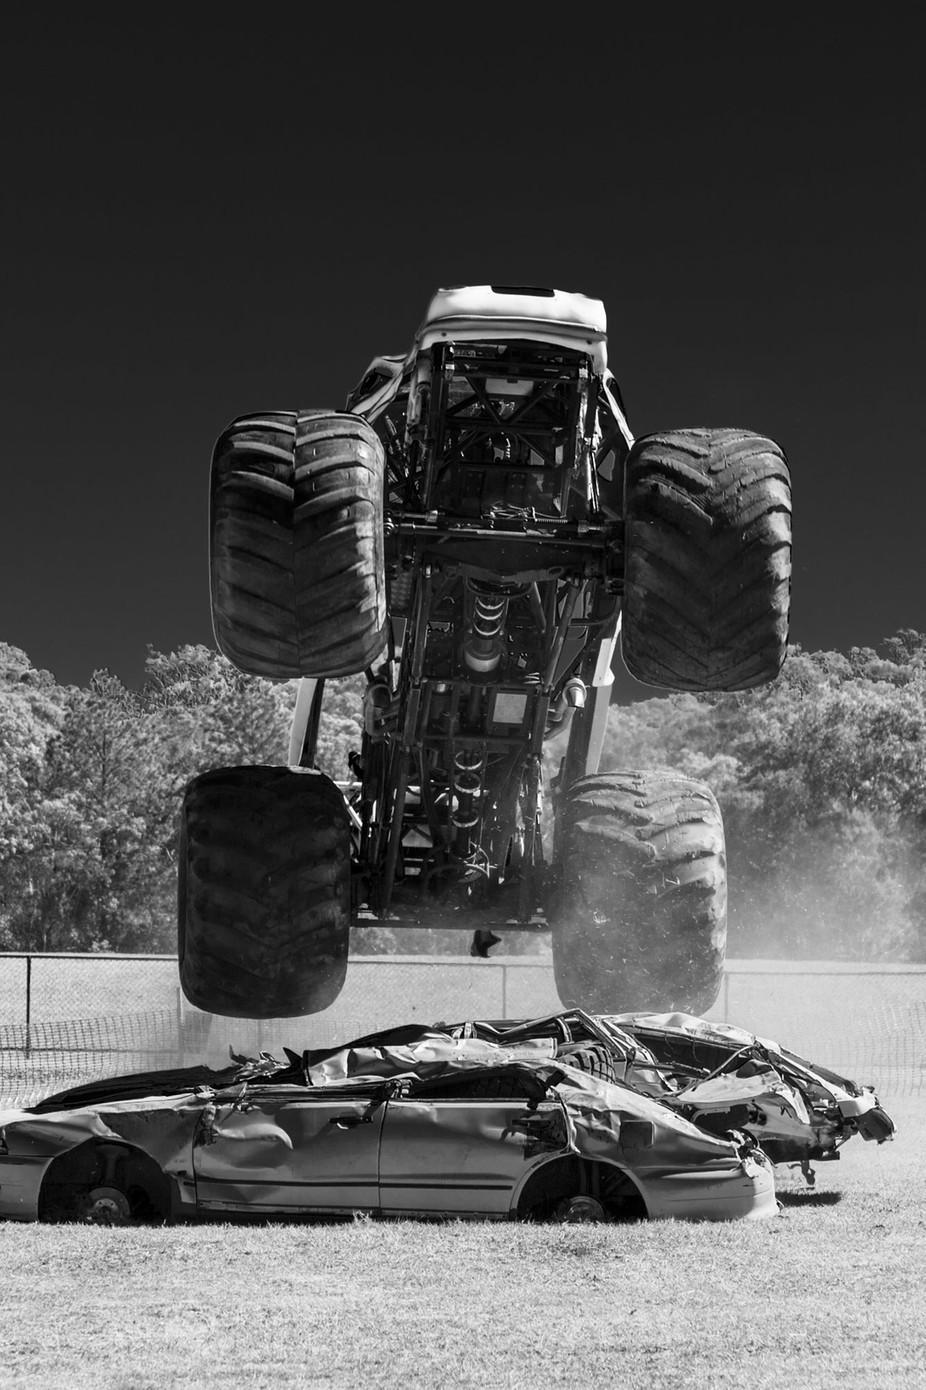 Monster Truck Jump by damienkeffyn - Large Photo Contest